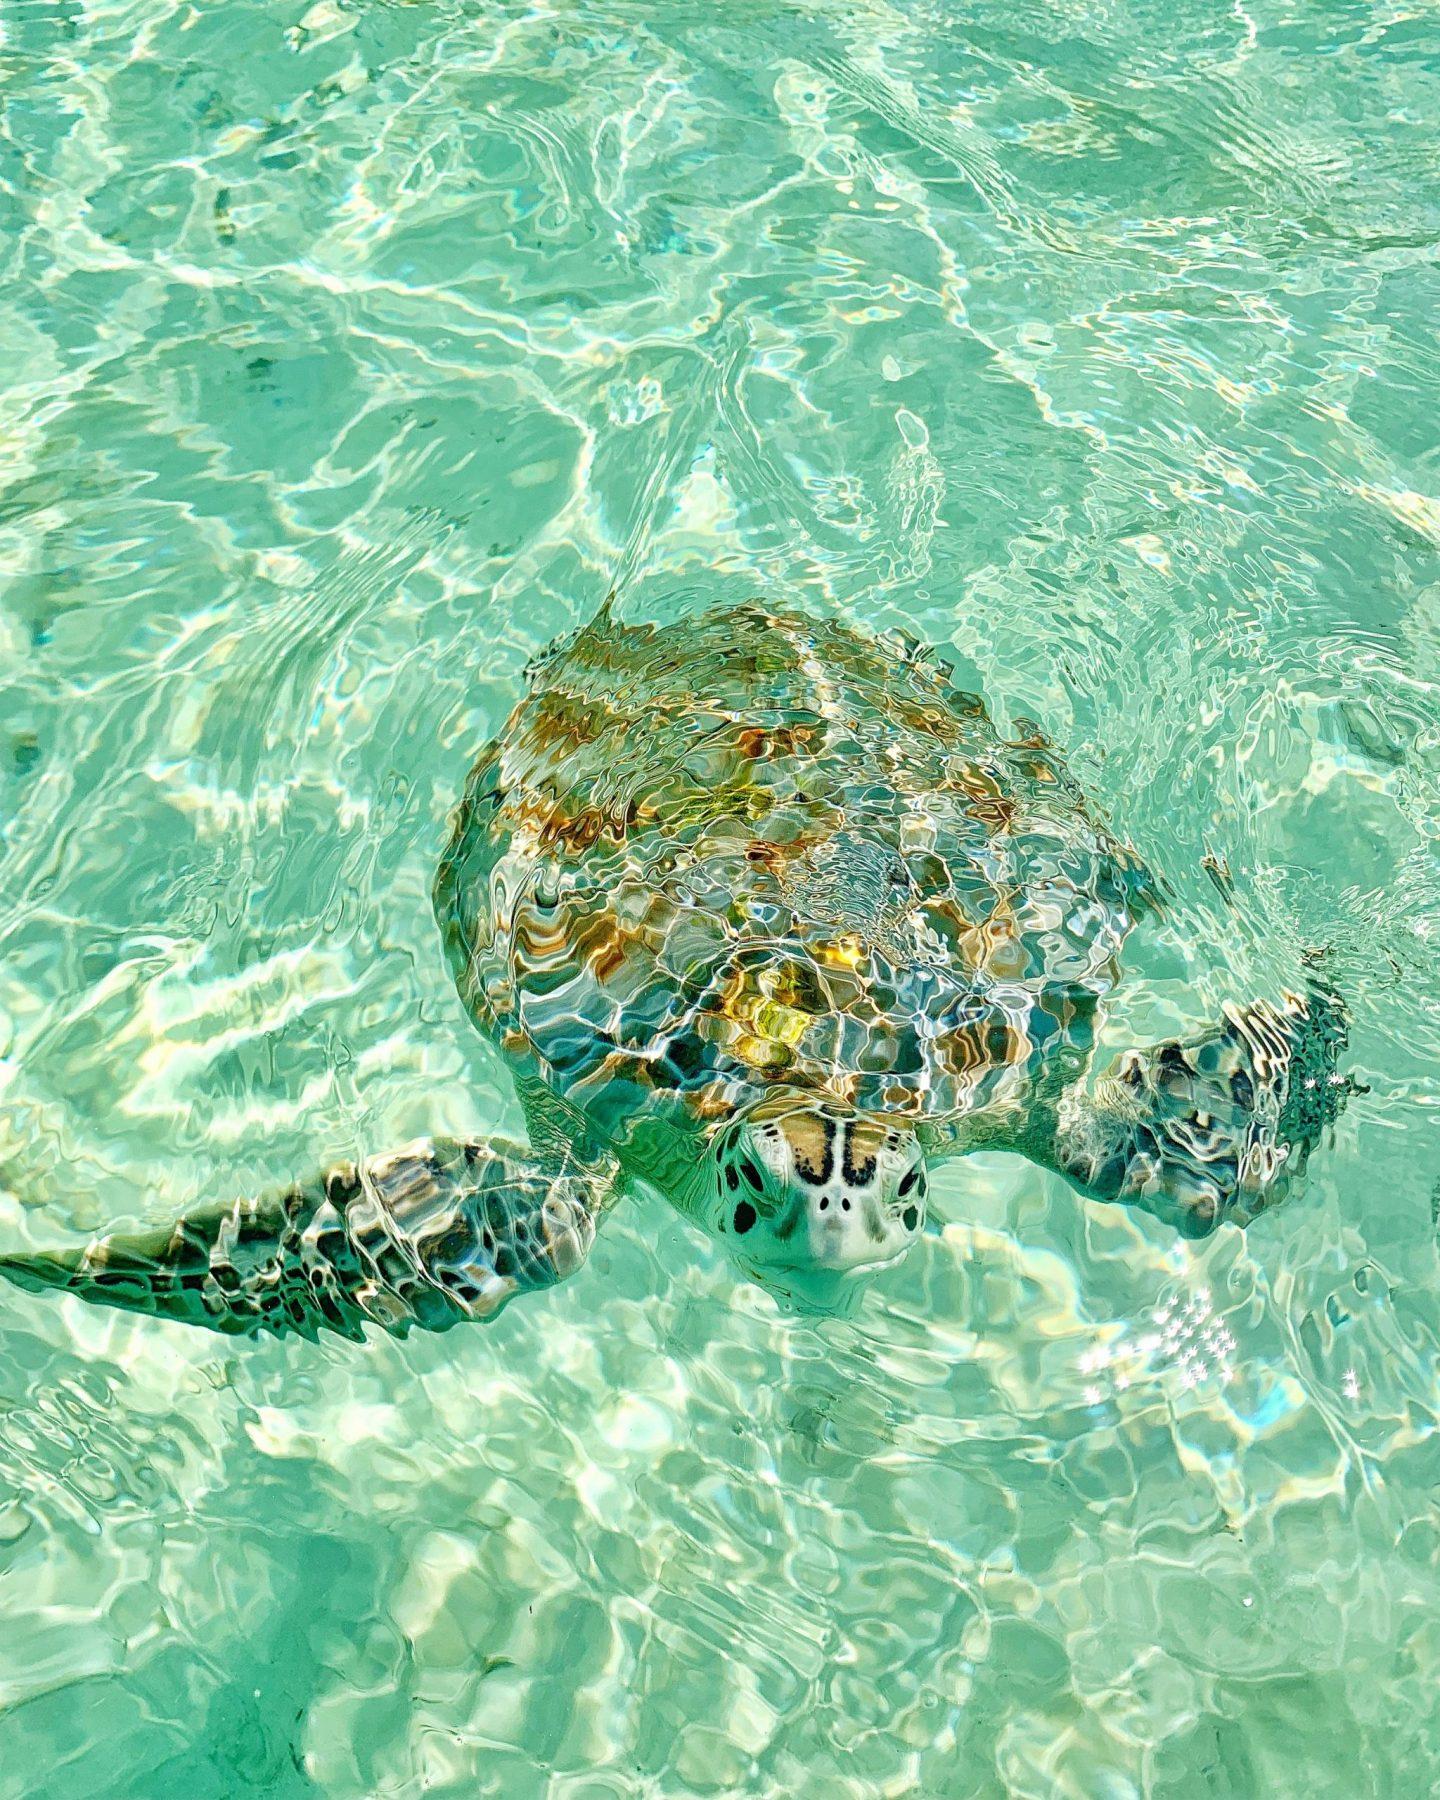 Wild Sea Turtles, The Bahamas